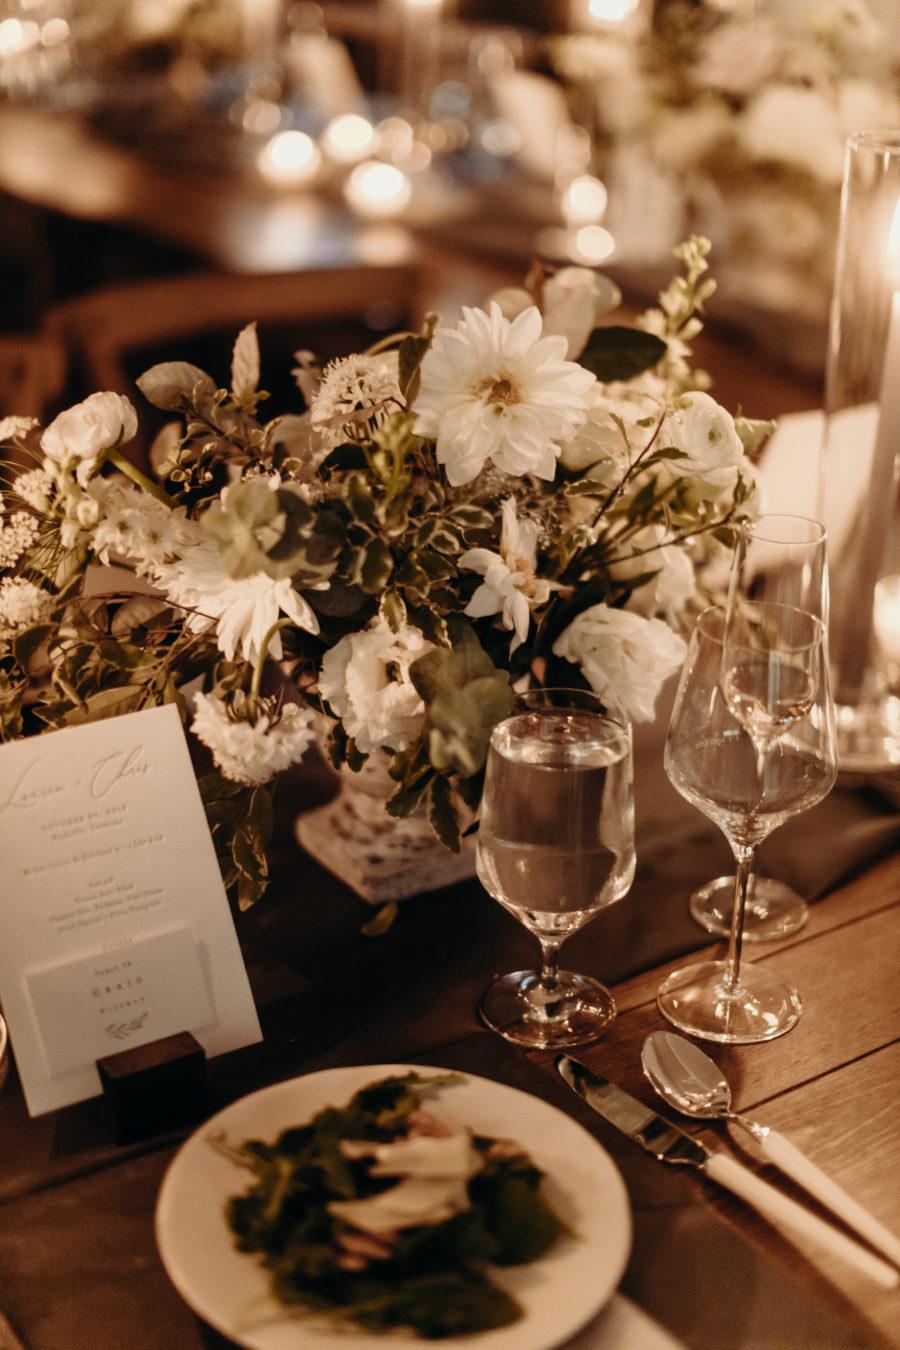 Lauren Bushnell and Chris Lane Nashville Wedding captured by Victoria Bonvinci